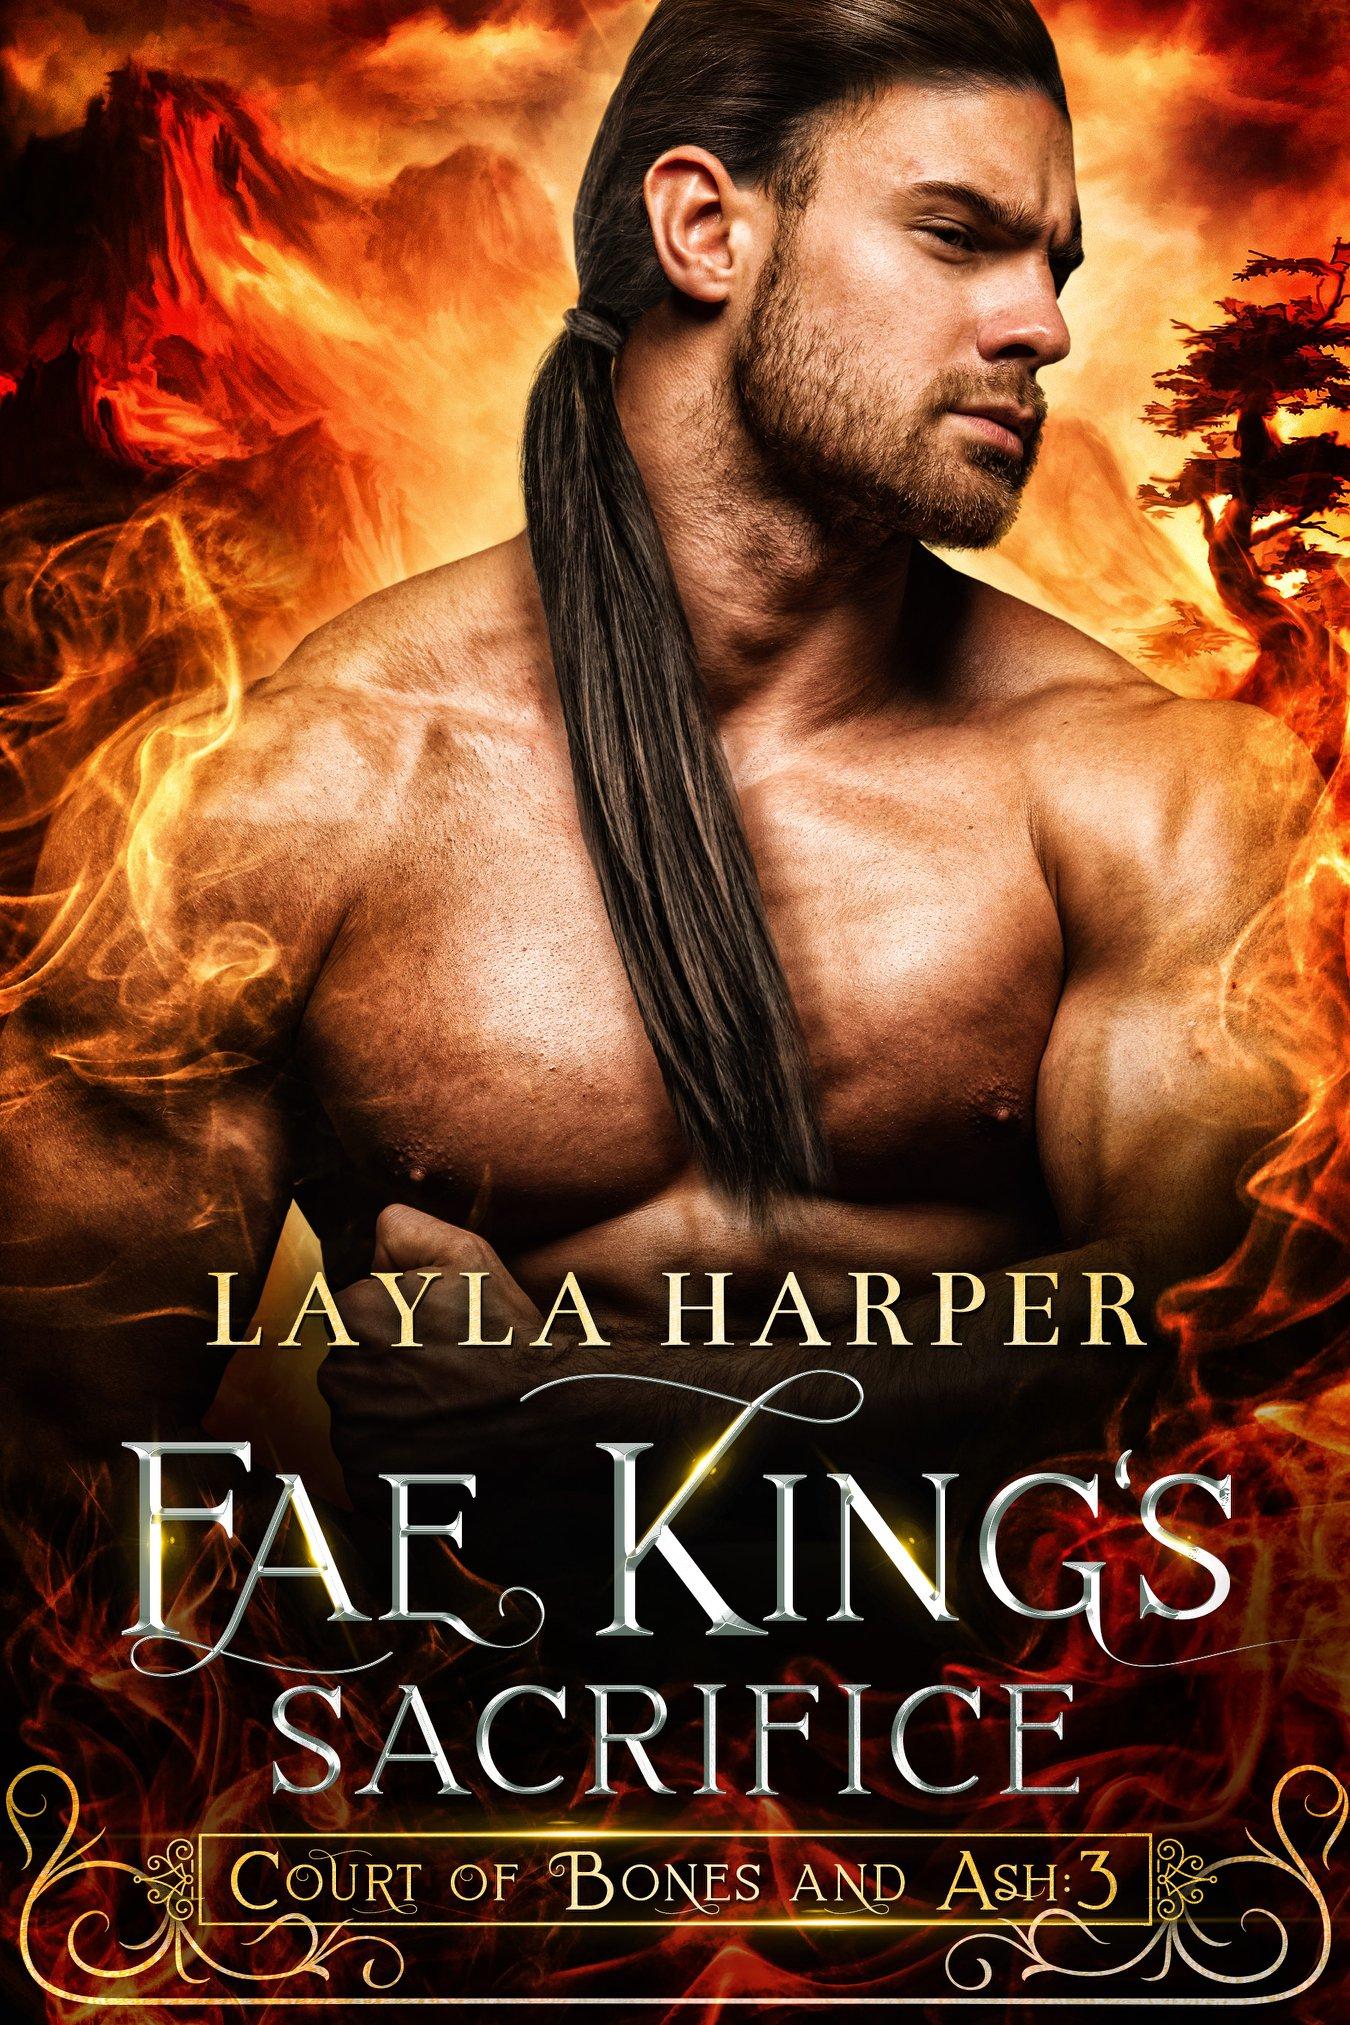 Fae King's Sacrifice (Court of Bones and Ash, #3)